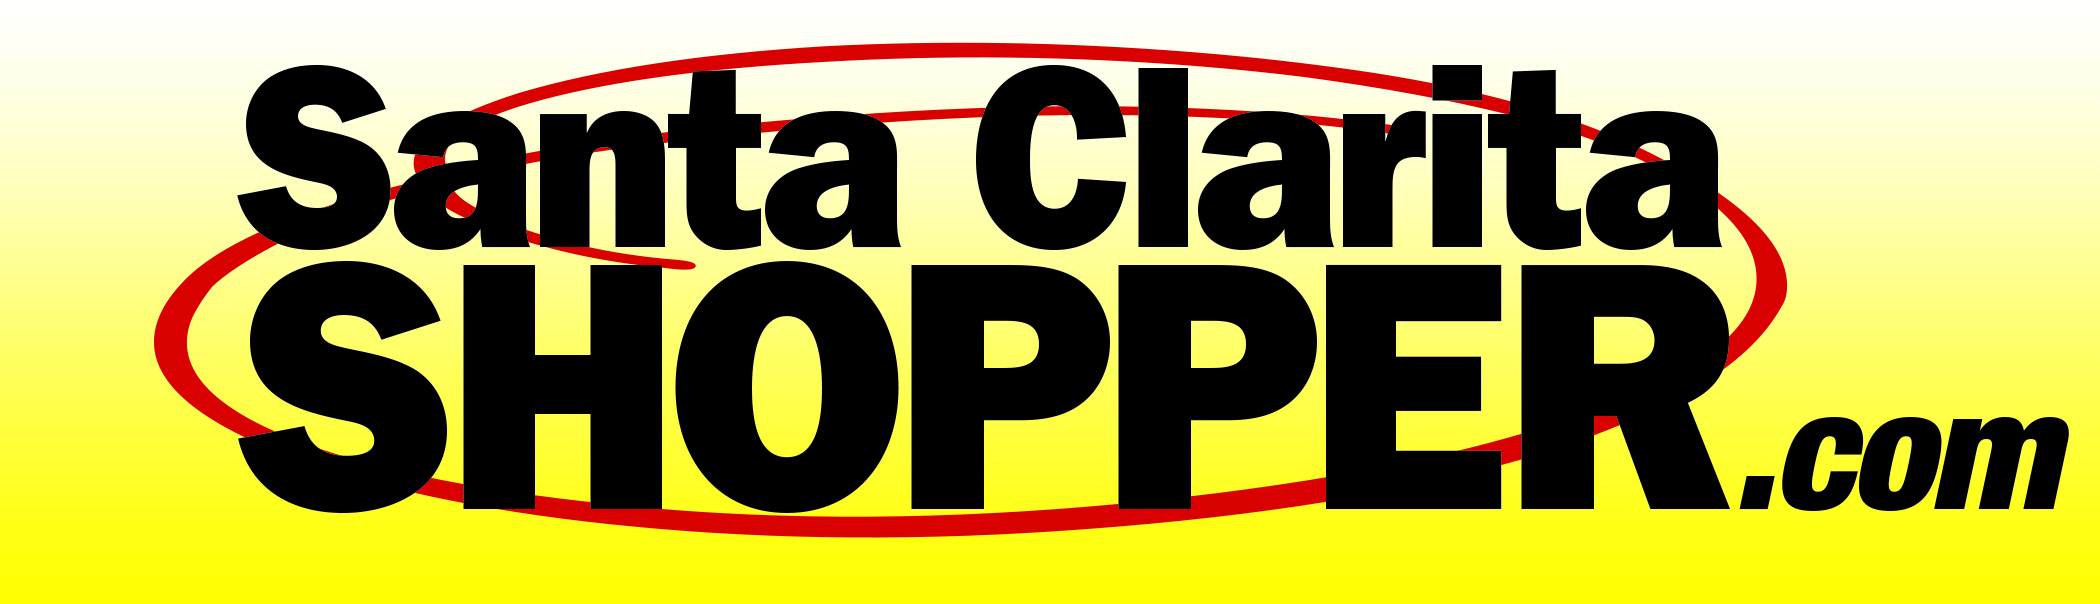 Santa_Clarita_Shopper.jpg